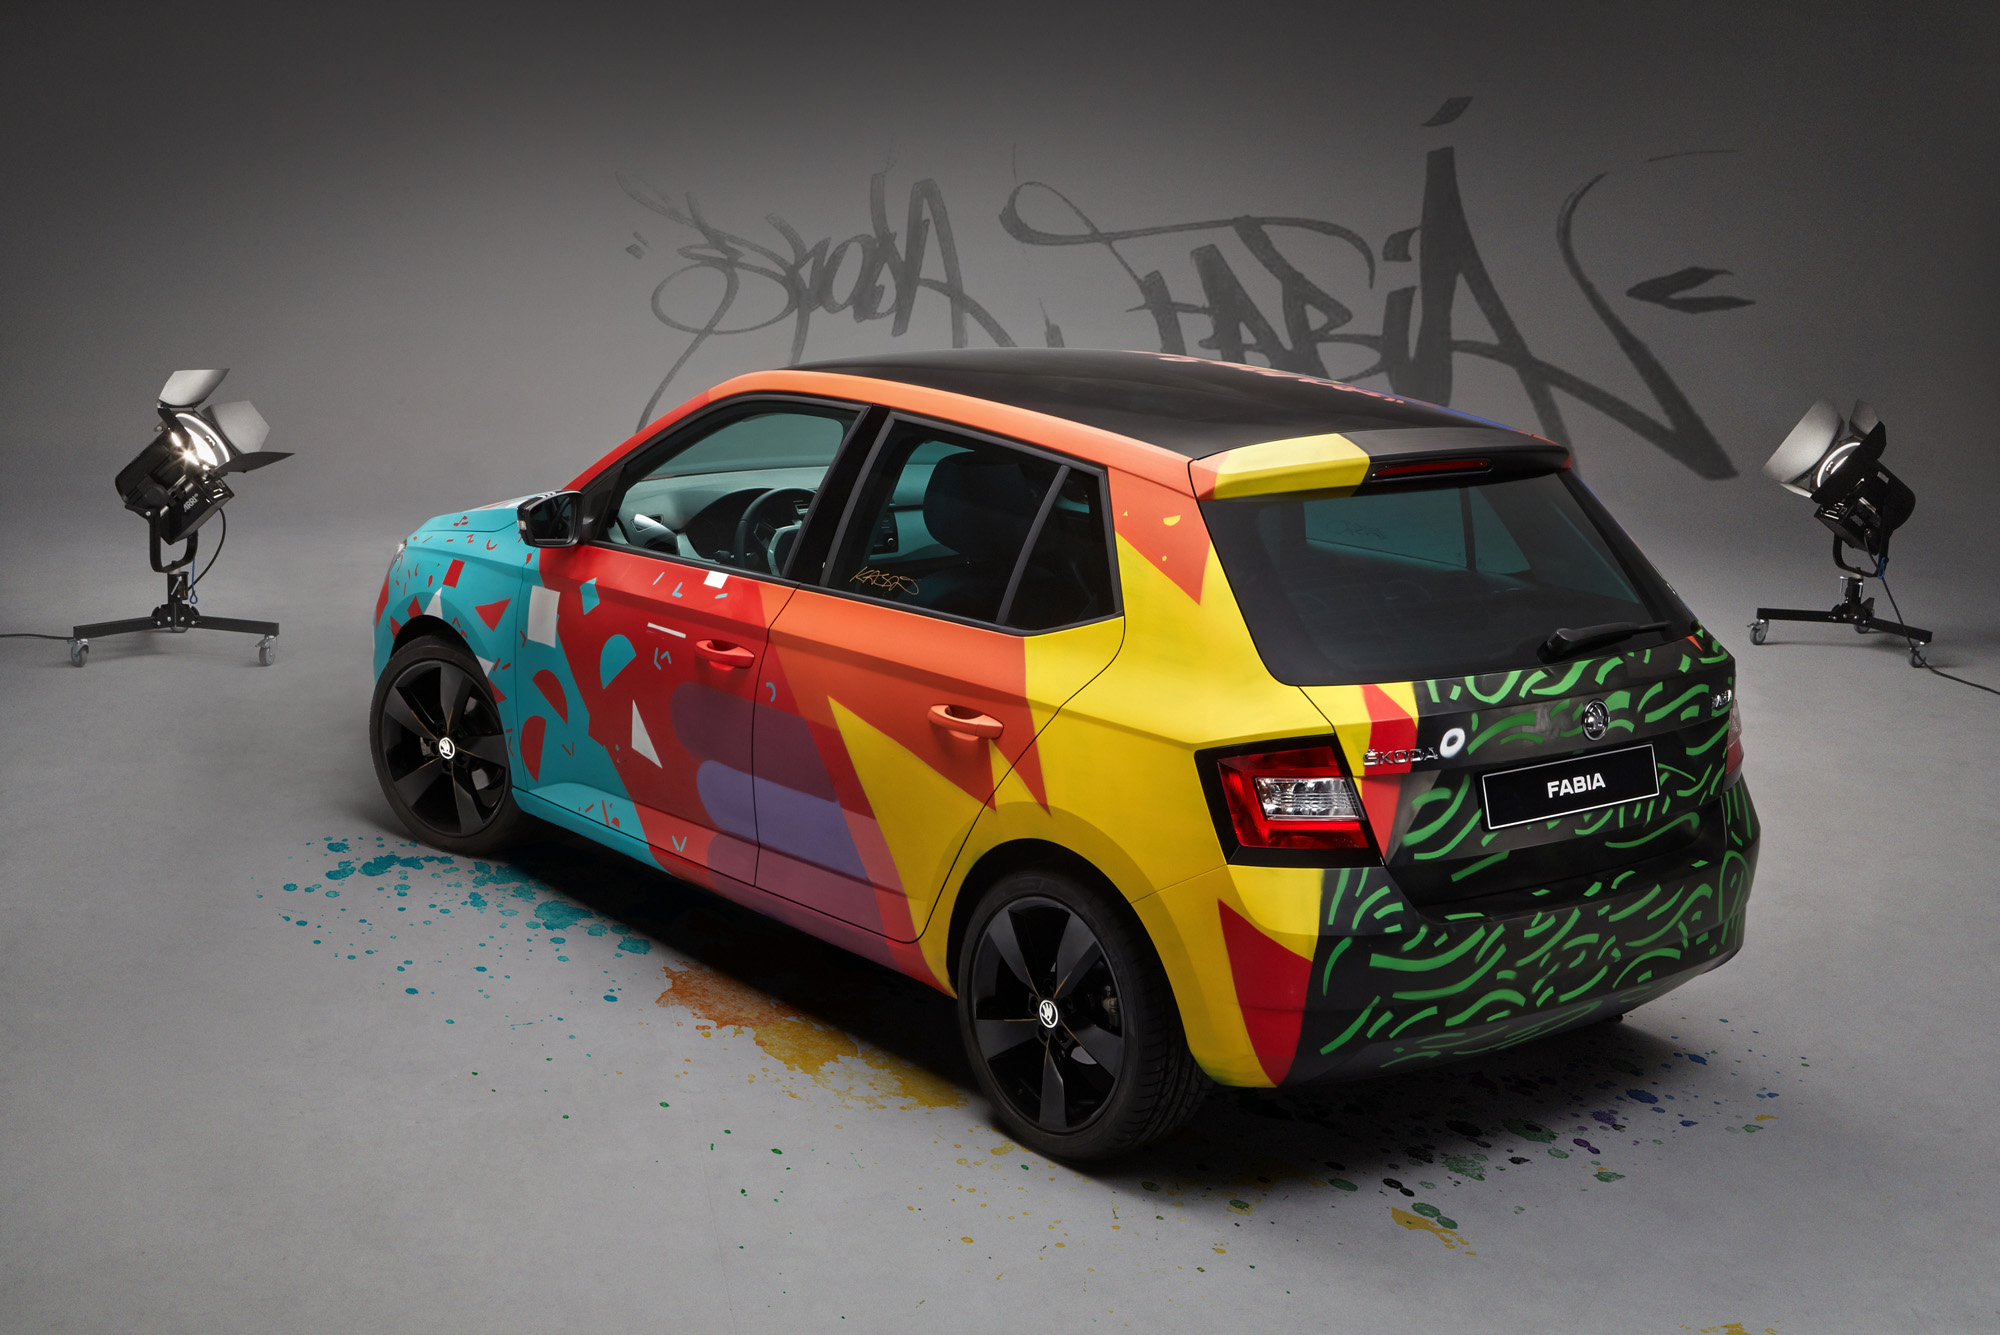 skoda-fabia-iii-street-art-design-003